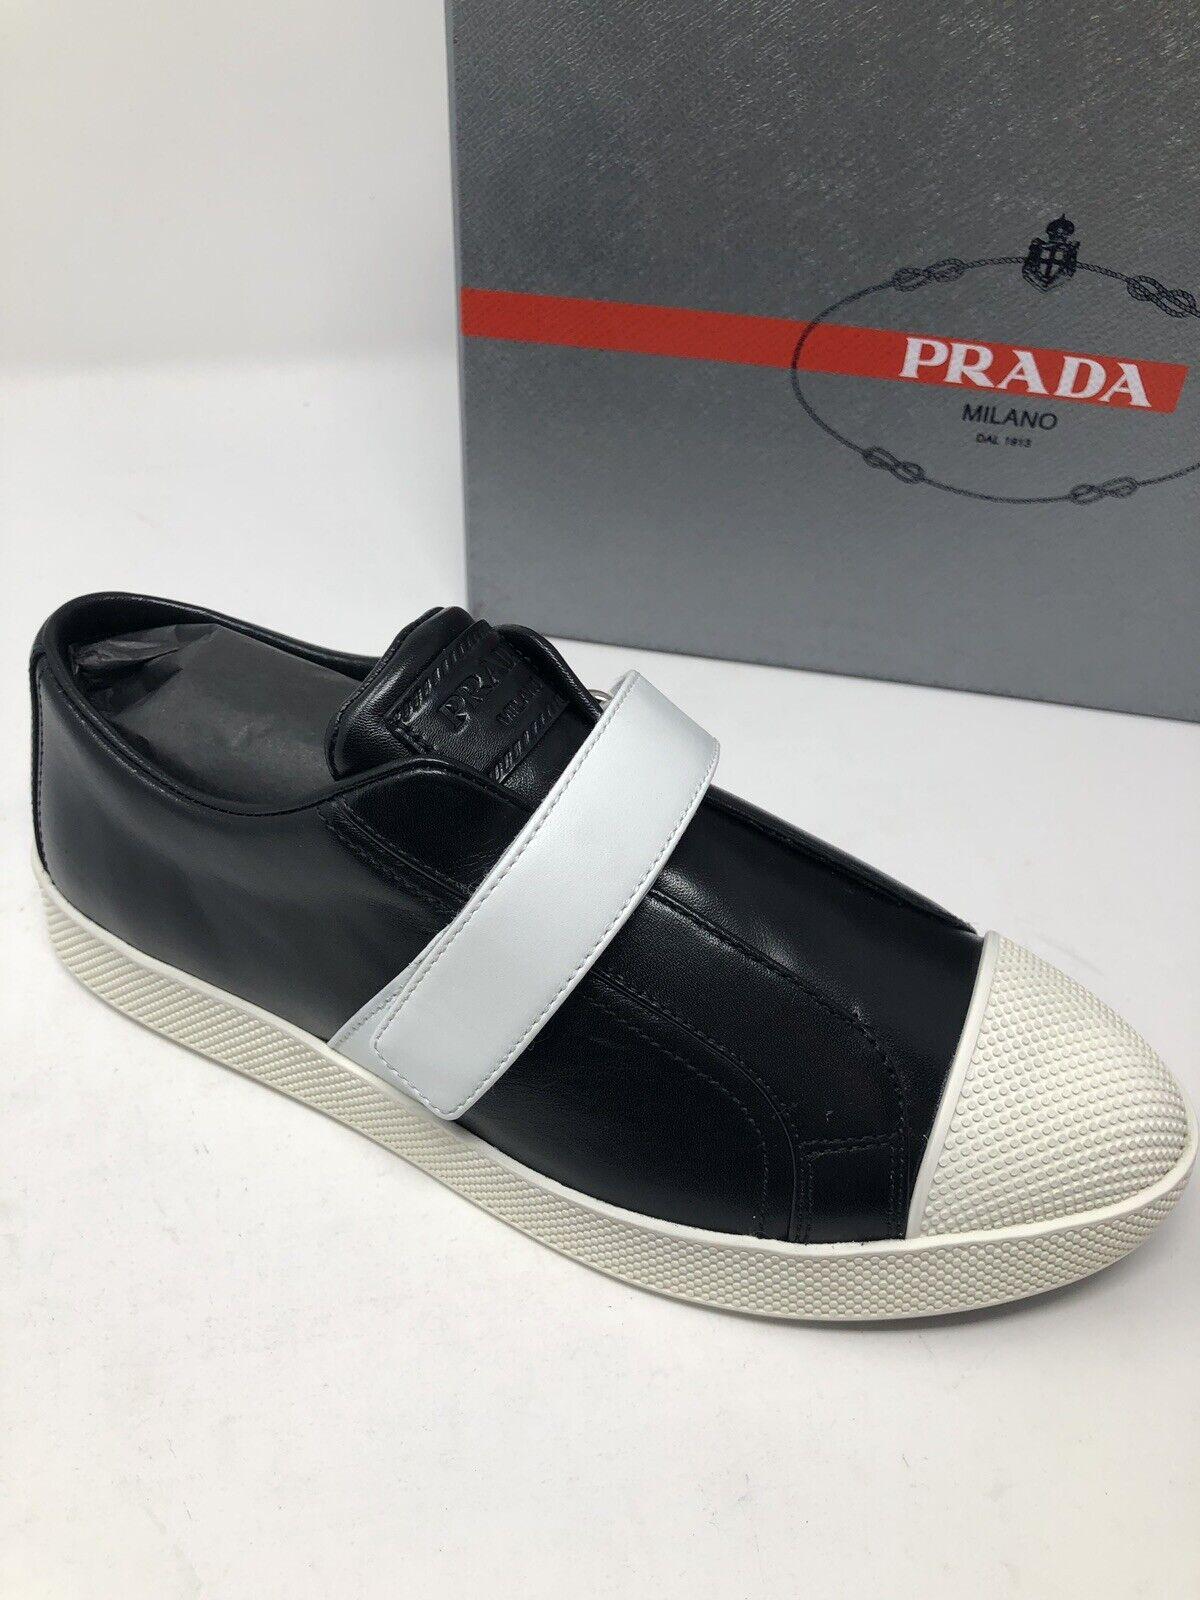 575 New PRADA Womens Vitelli Black Sneakers Ladies shoes Size 7 US 37 UK